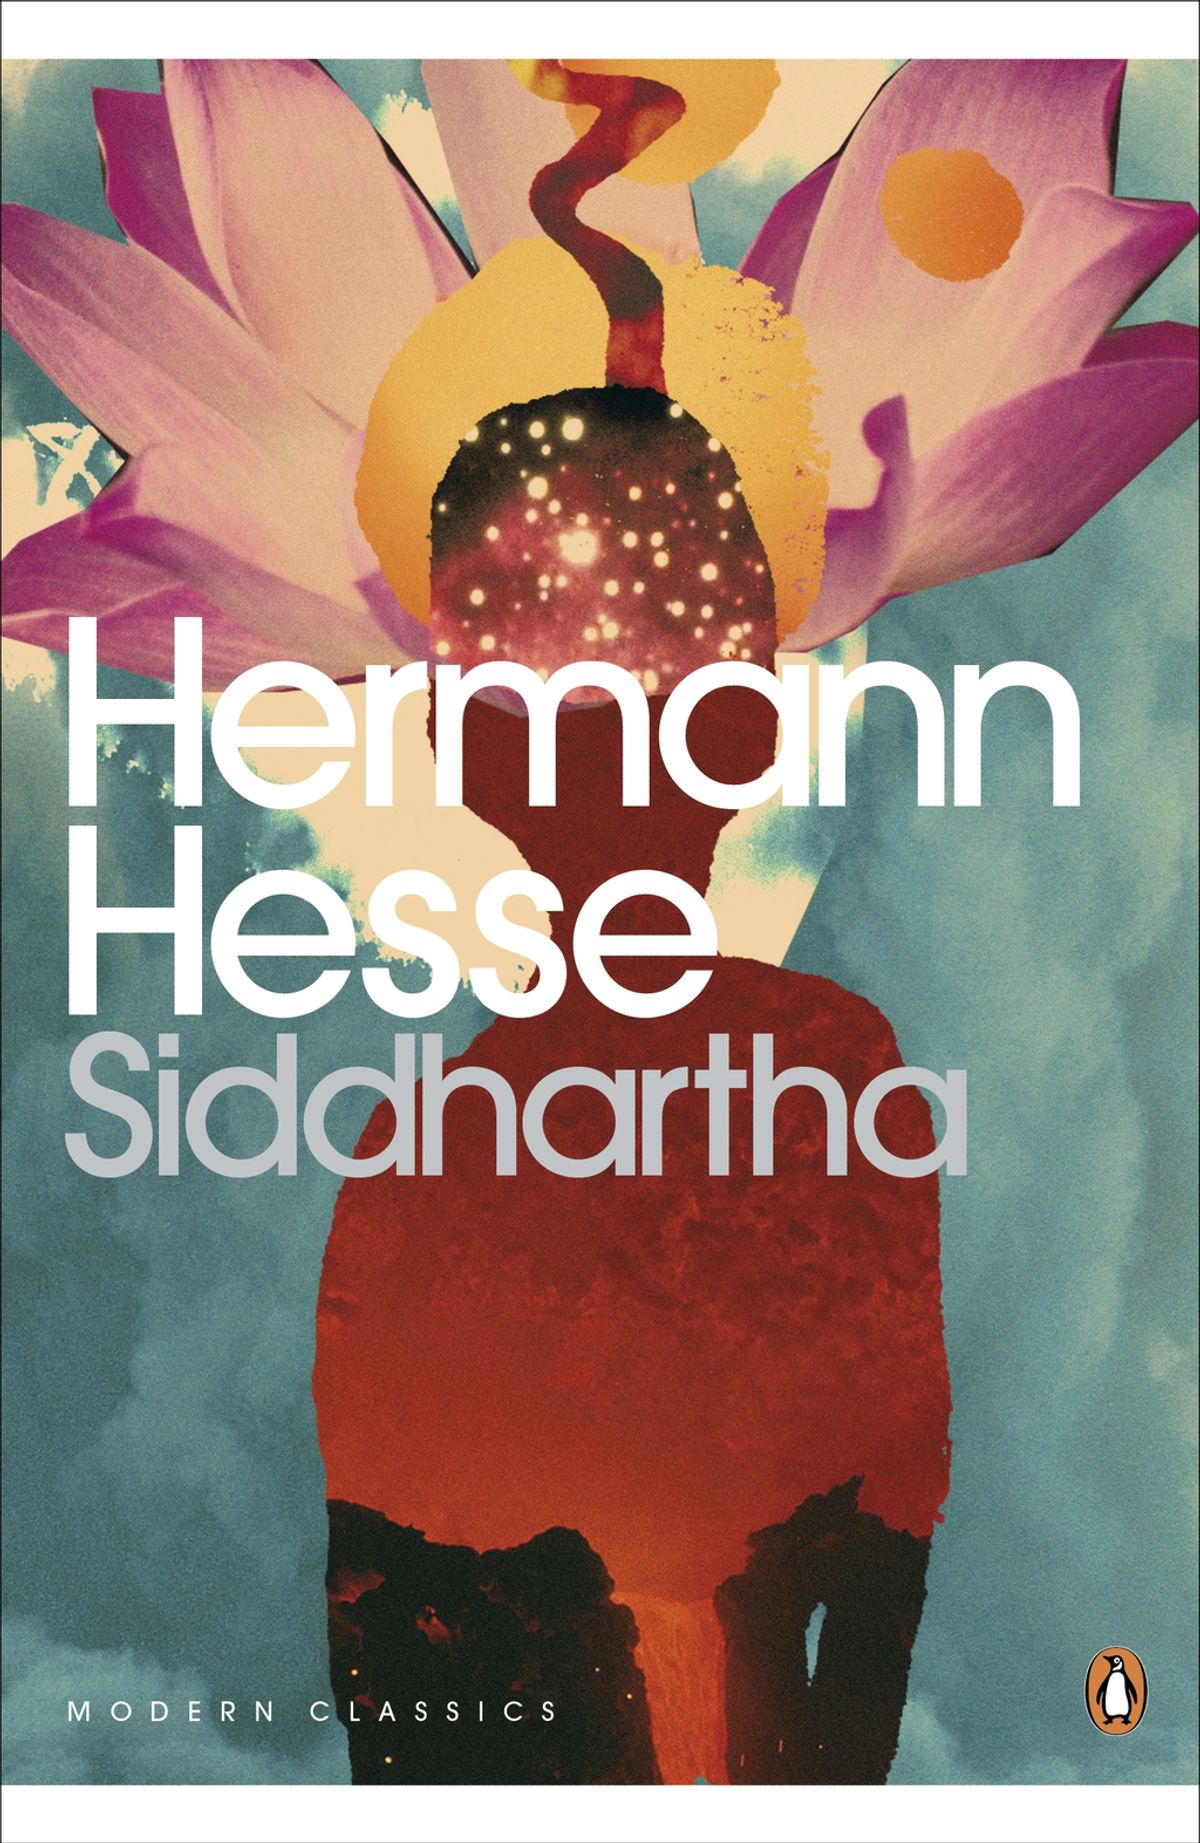 Podcast: Siddhartha, Herrmann Hesse – A Reflective Review